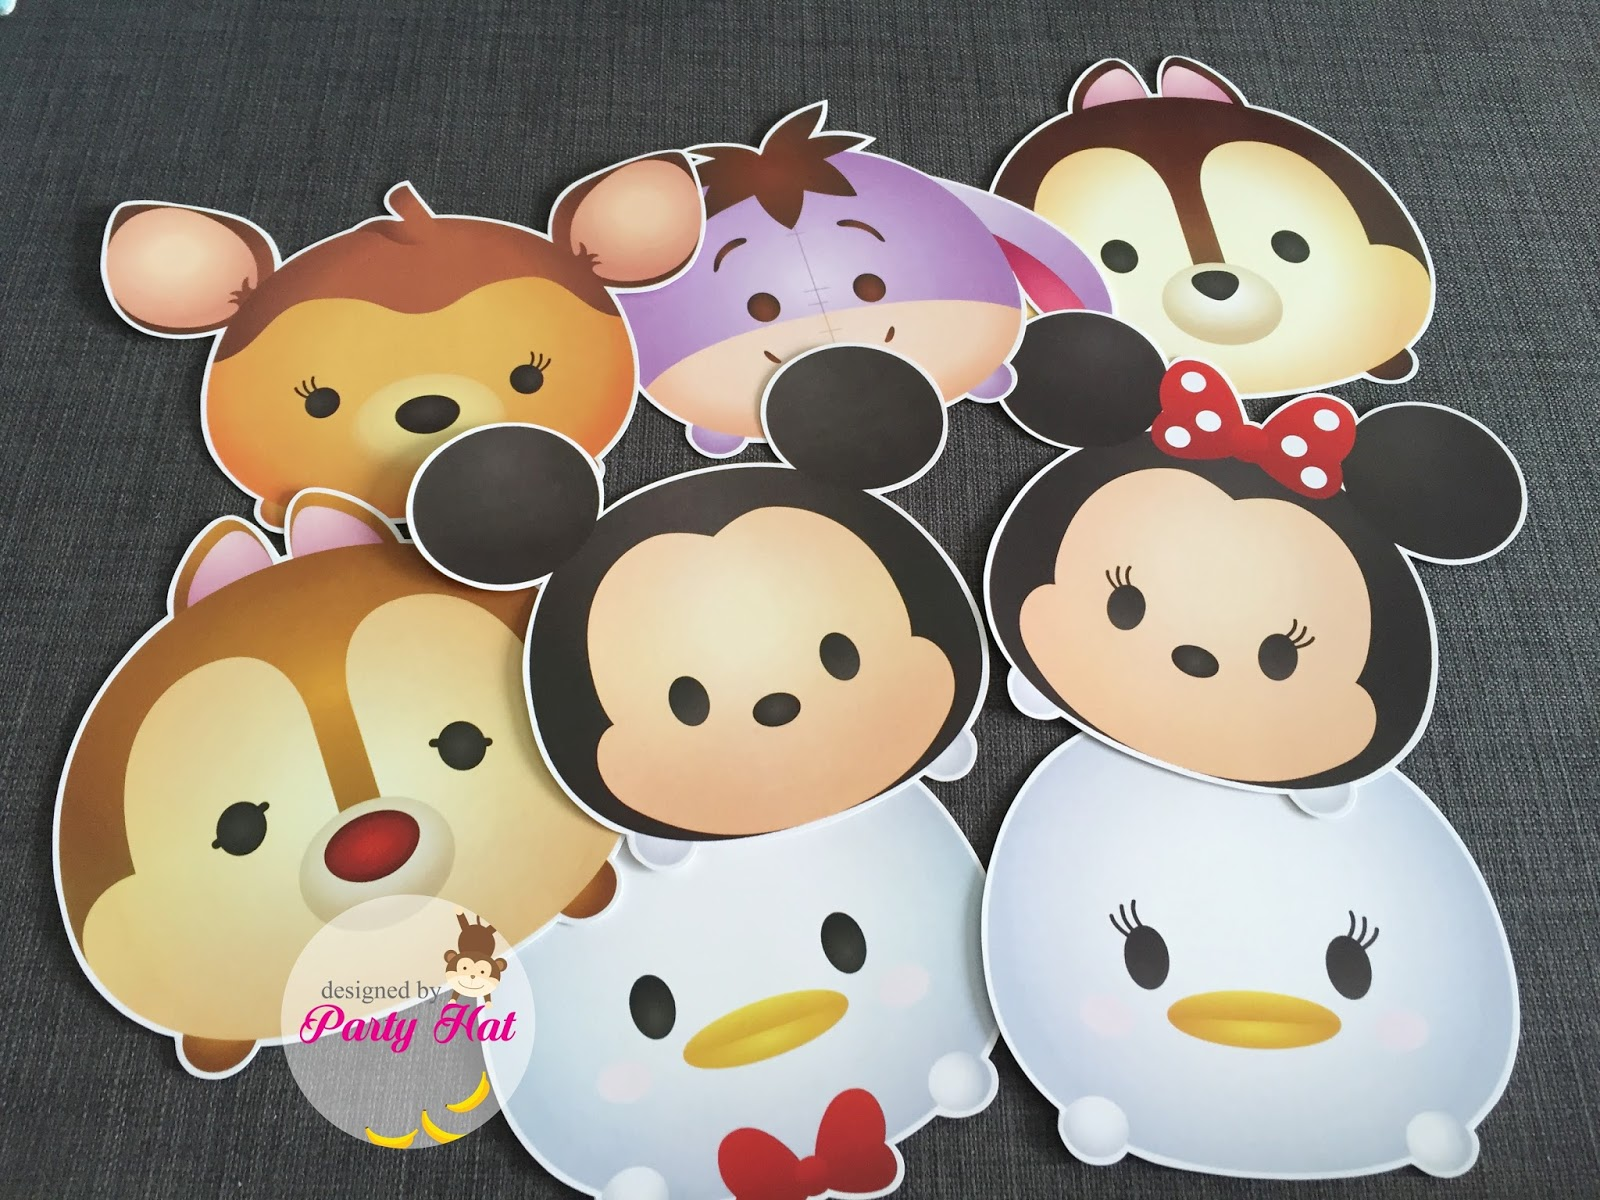 Party Hat Disney Tsum Tsum 1 Year Old Birthday For Jayden